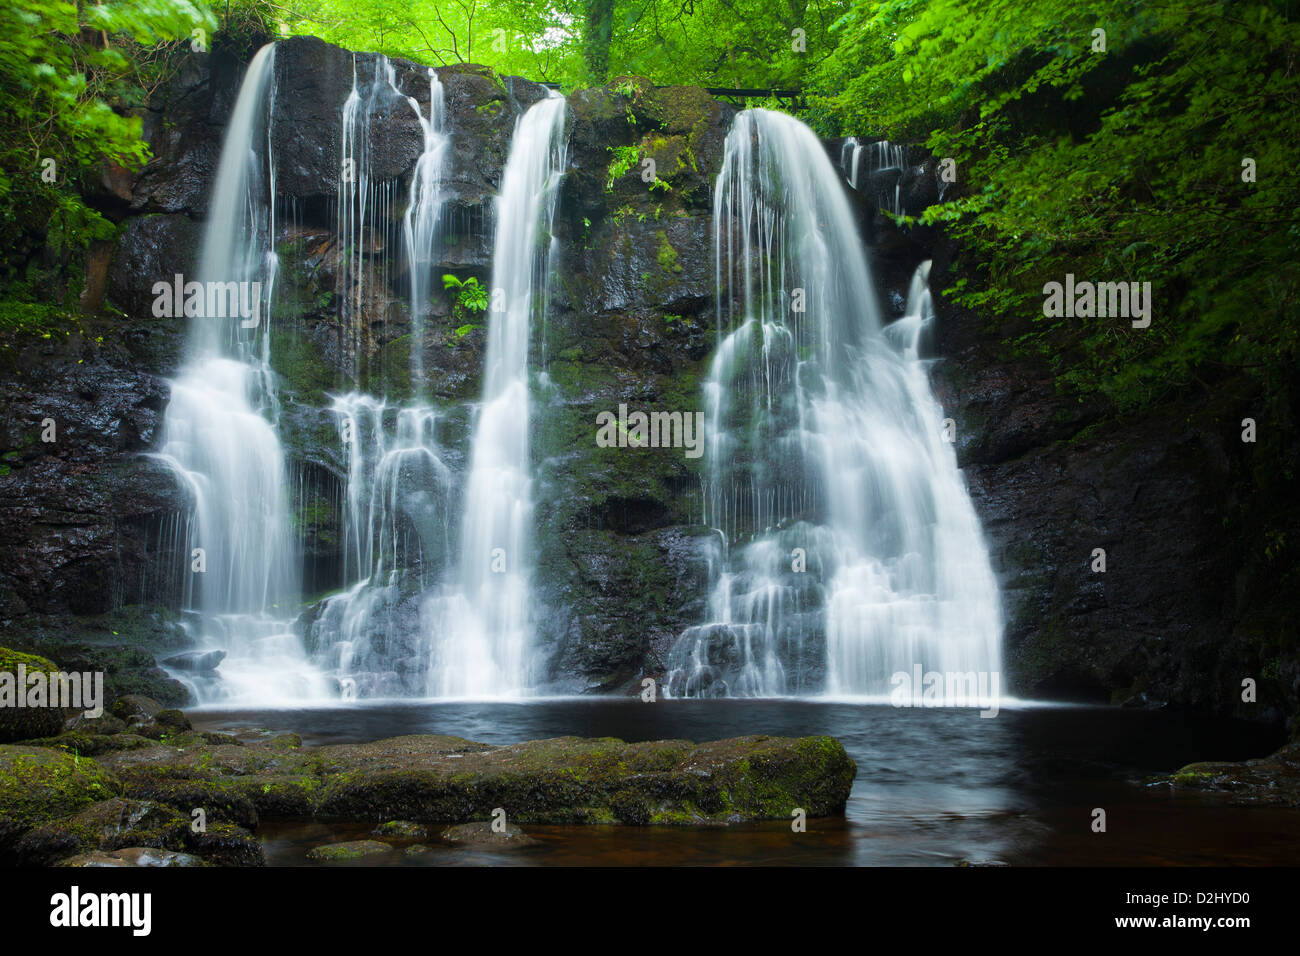 Ess-Na-Crub Wasserfall, Glenariff Forest Park, County Antrim, Nordirland. Stockbild